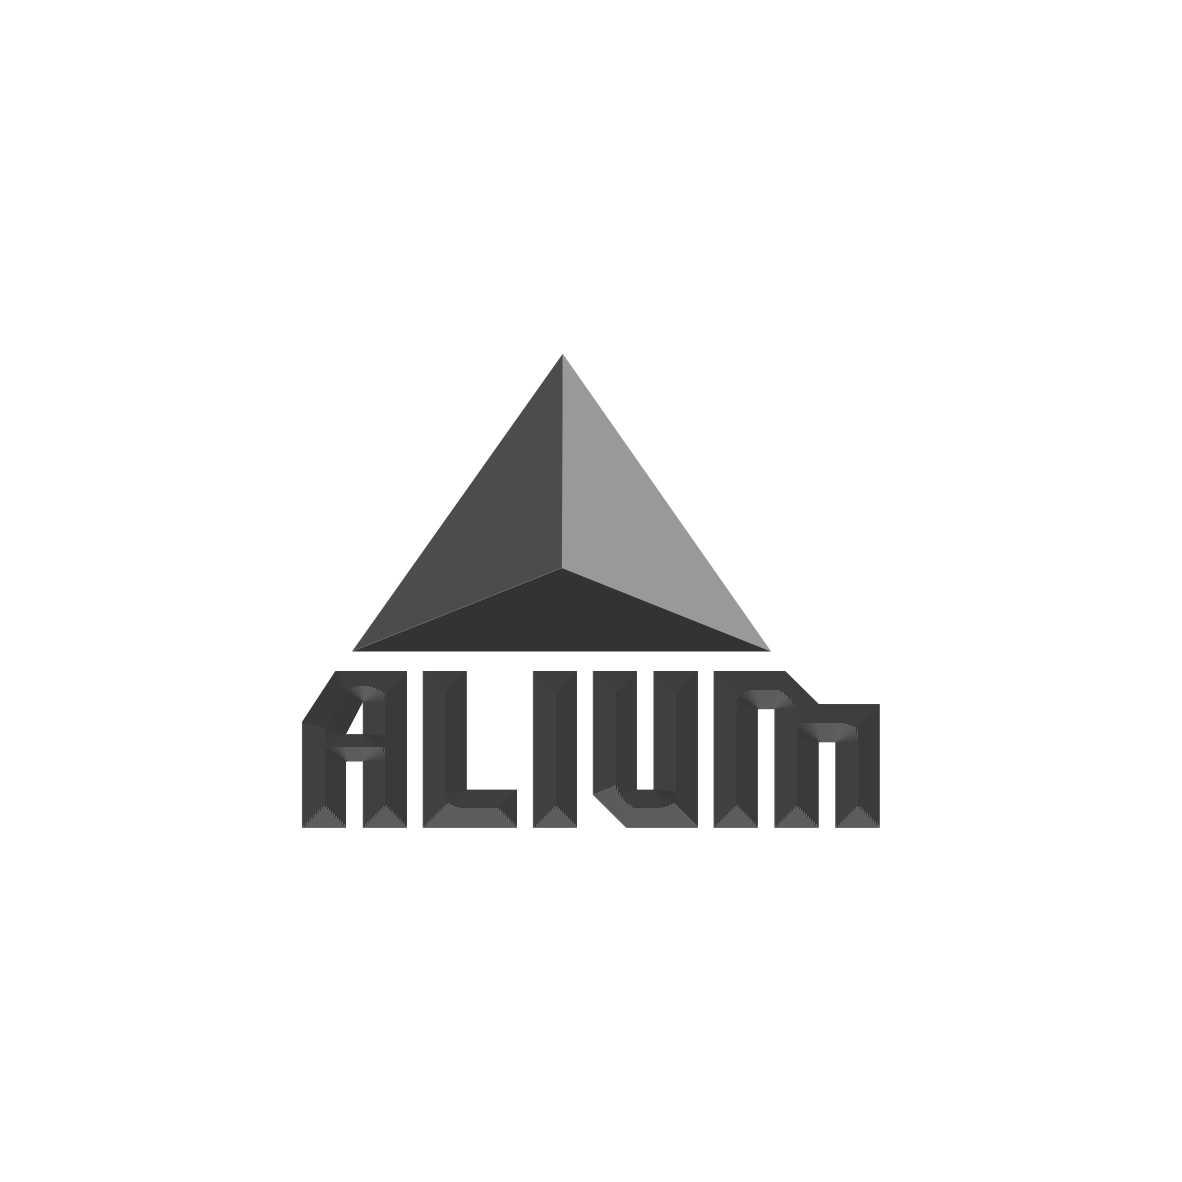 Логотип для дизайн студии фото f_74659e87a87b8470.jpg